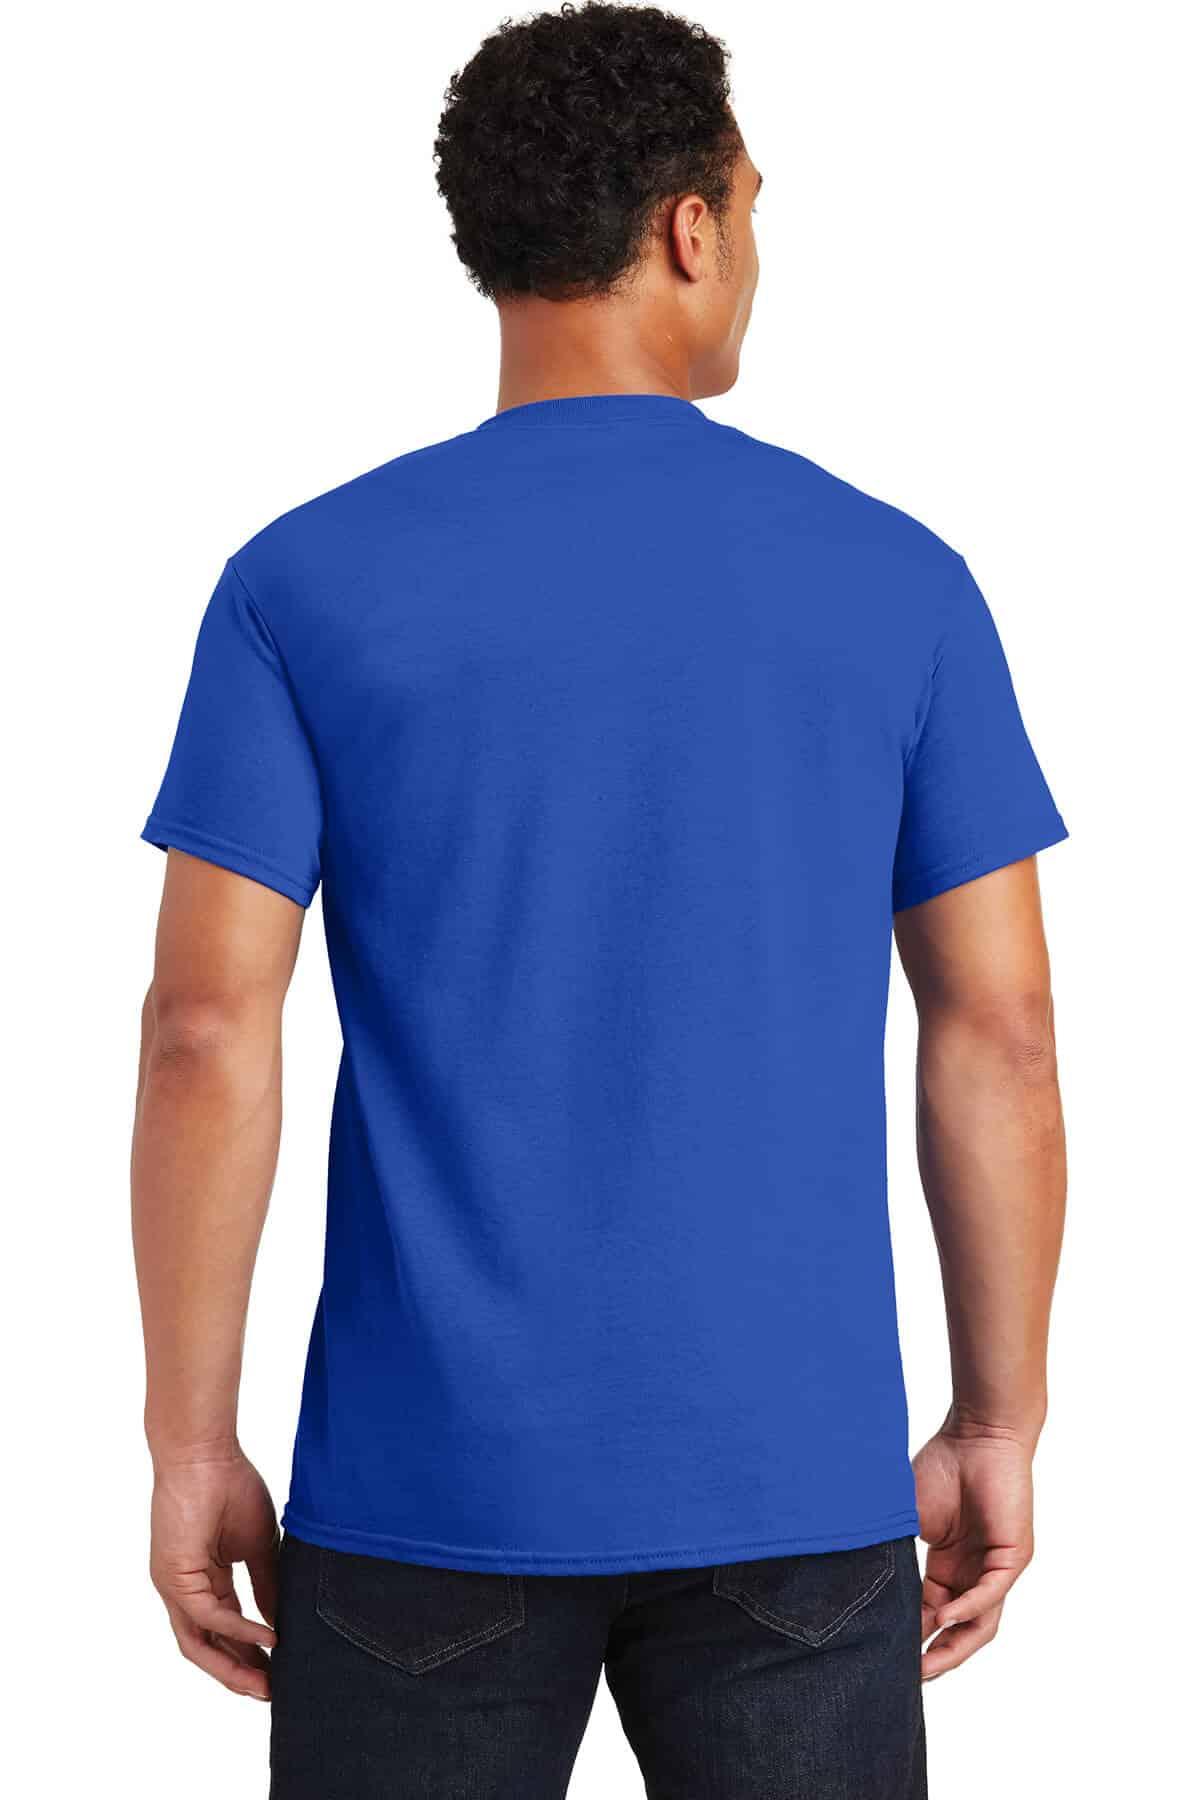 Royal Teeshirt Back